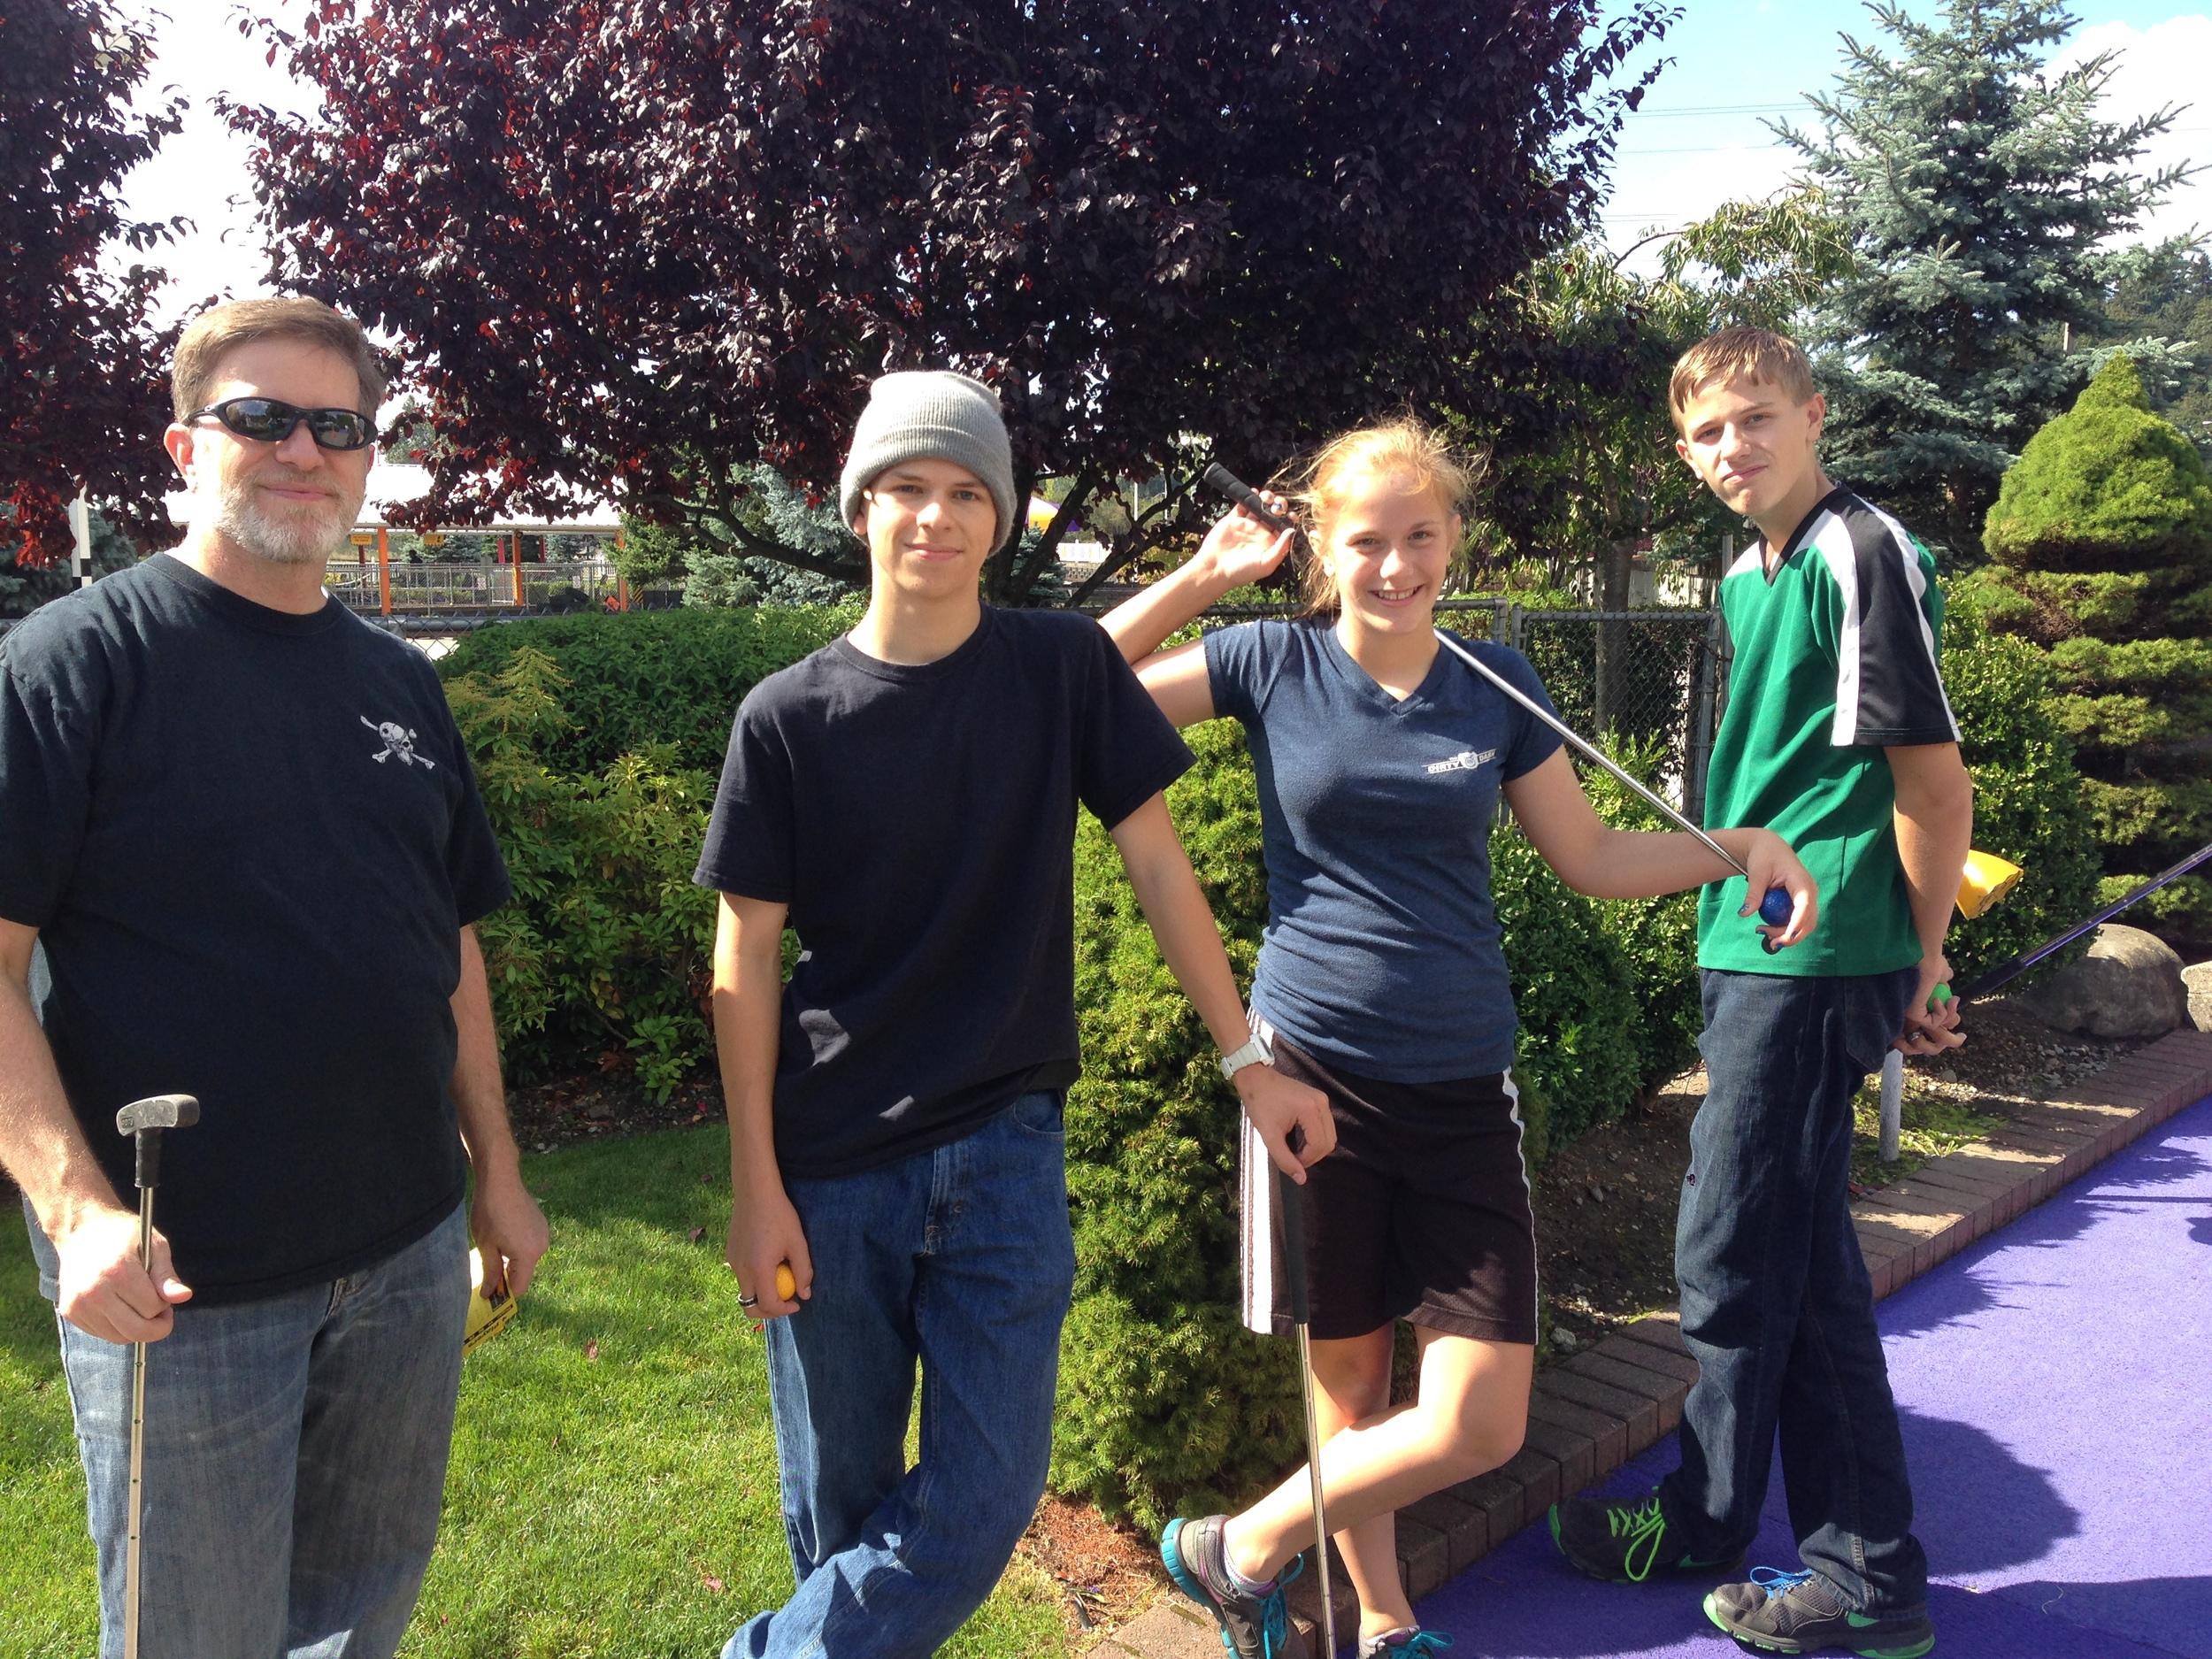 Steve, Matt, Jessie and Chris playing golf.